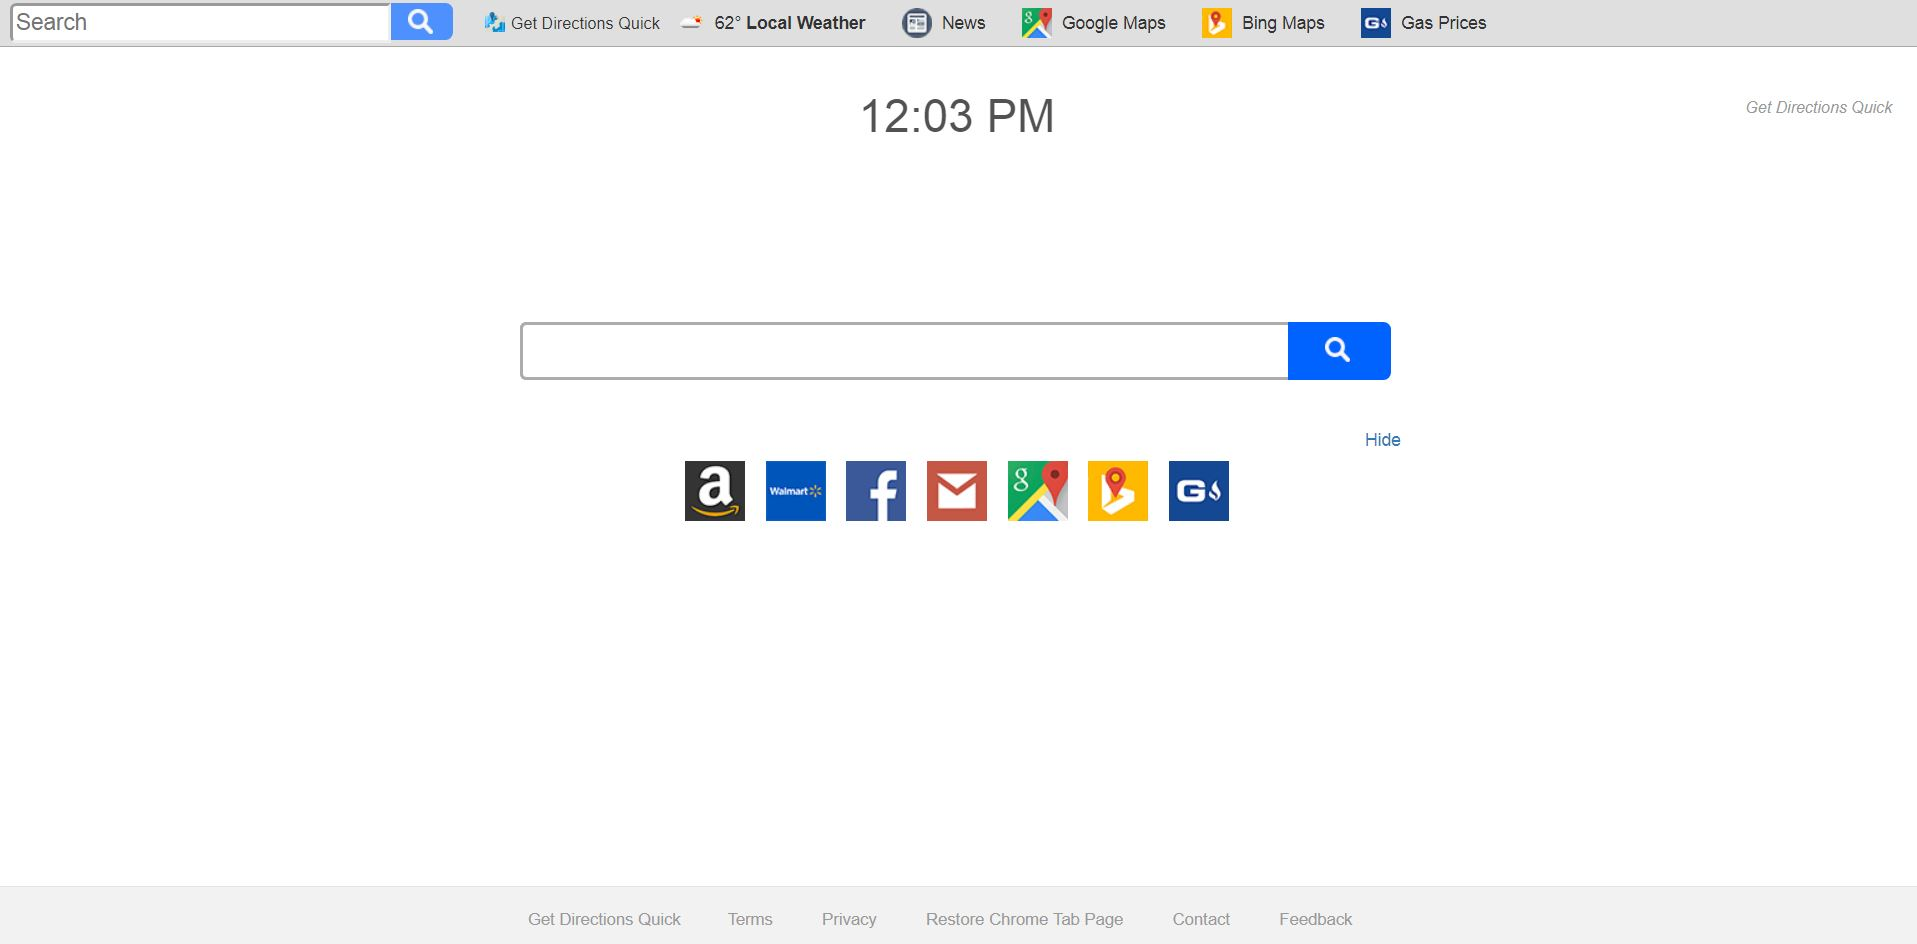 remove Search.searchgmfs3.com Get Directions Quick in full sensorstechforum com